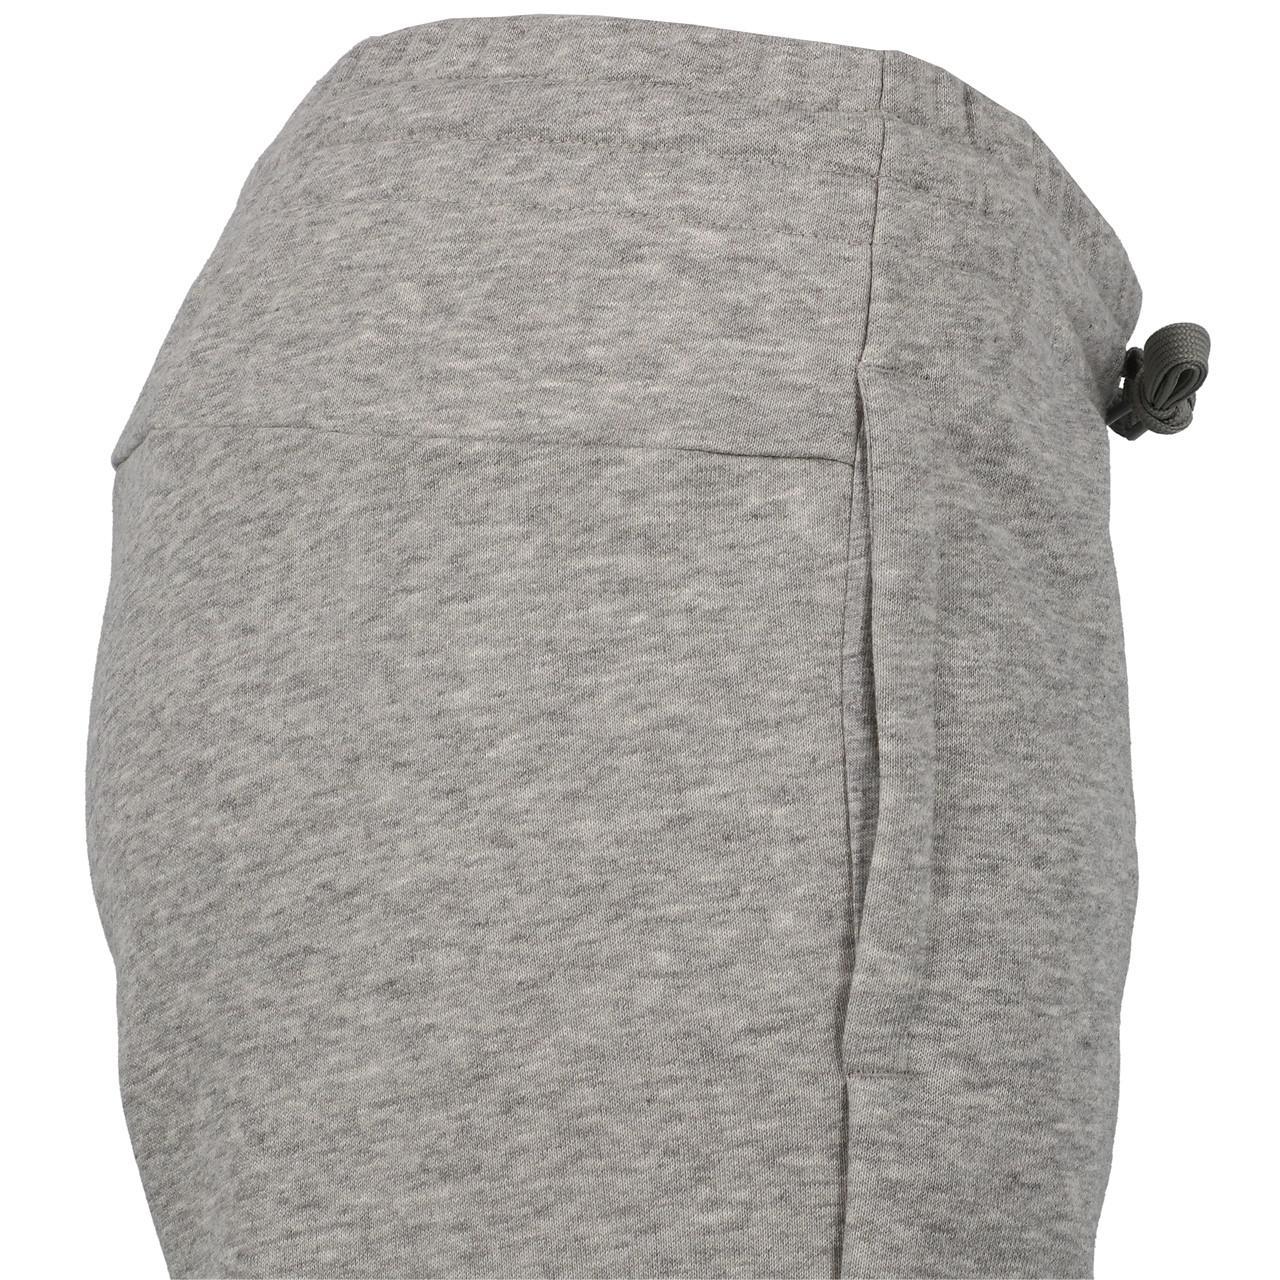 Pantalon-de-survetement-Adidas-E-pln-pant-grey-mel-l-Gris-18973-Neuf miniature 4